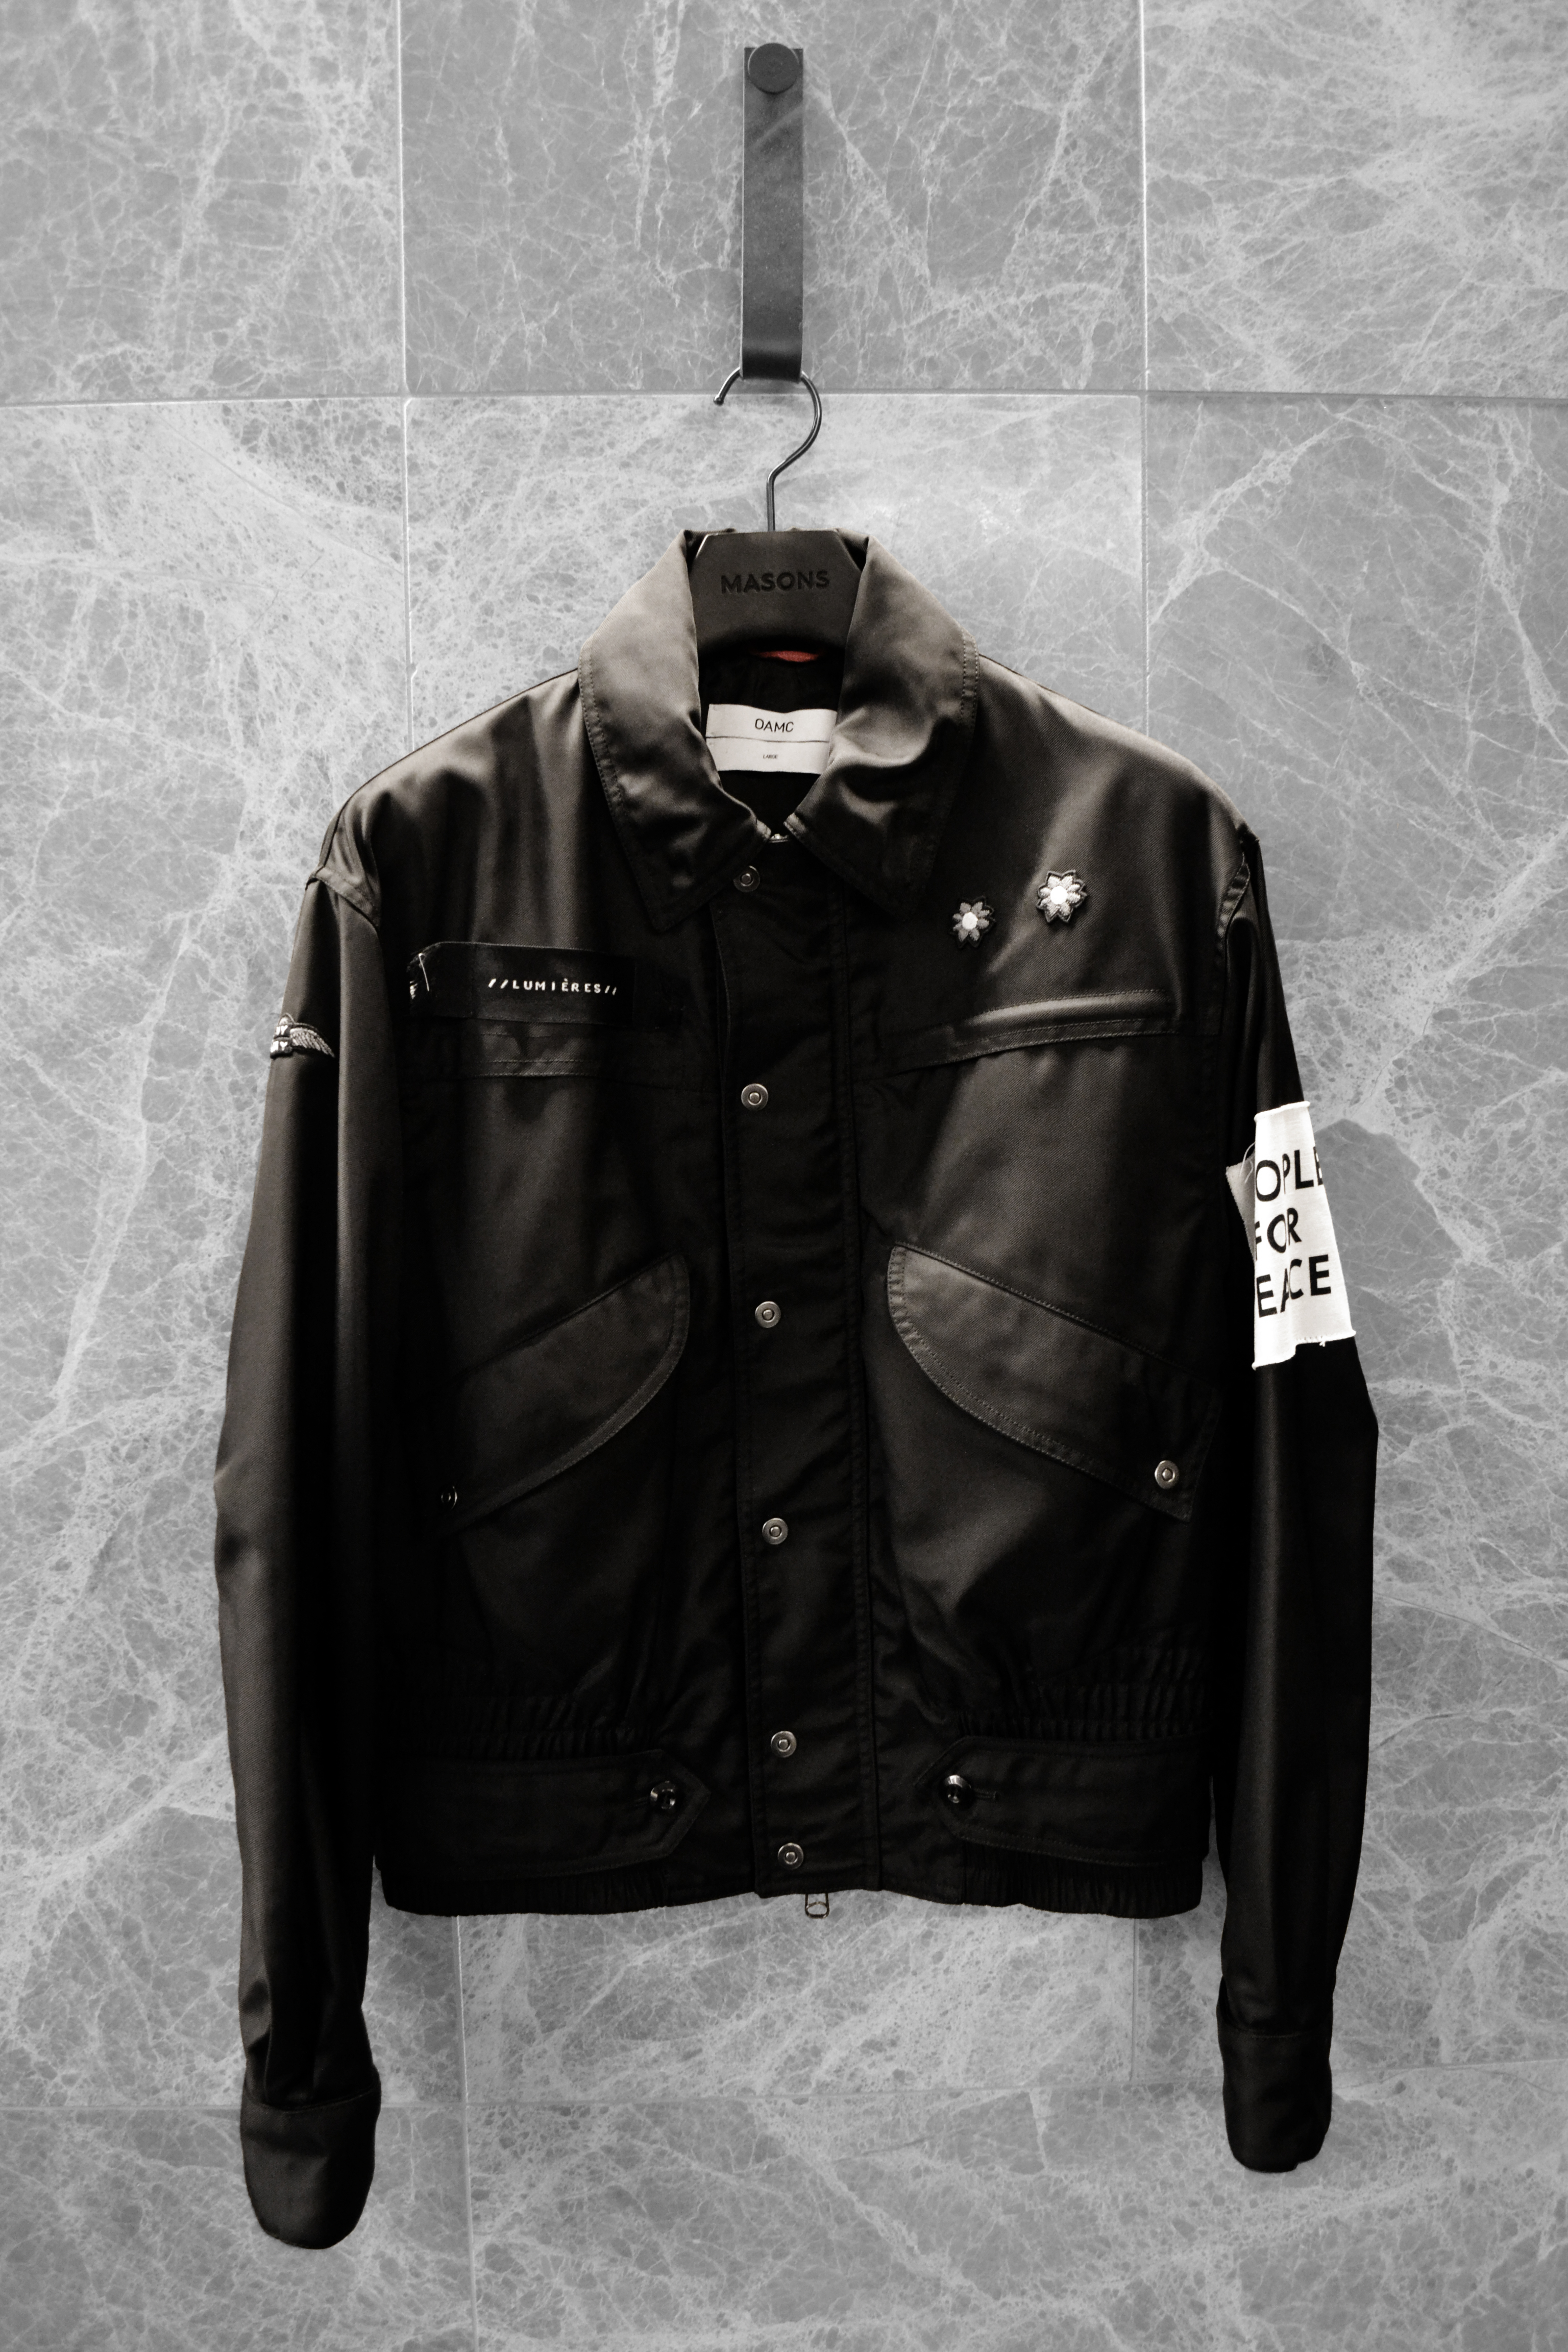 pics MASONS Brings Exclusive Menswear To Melbournes Fashion Precinct